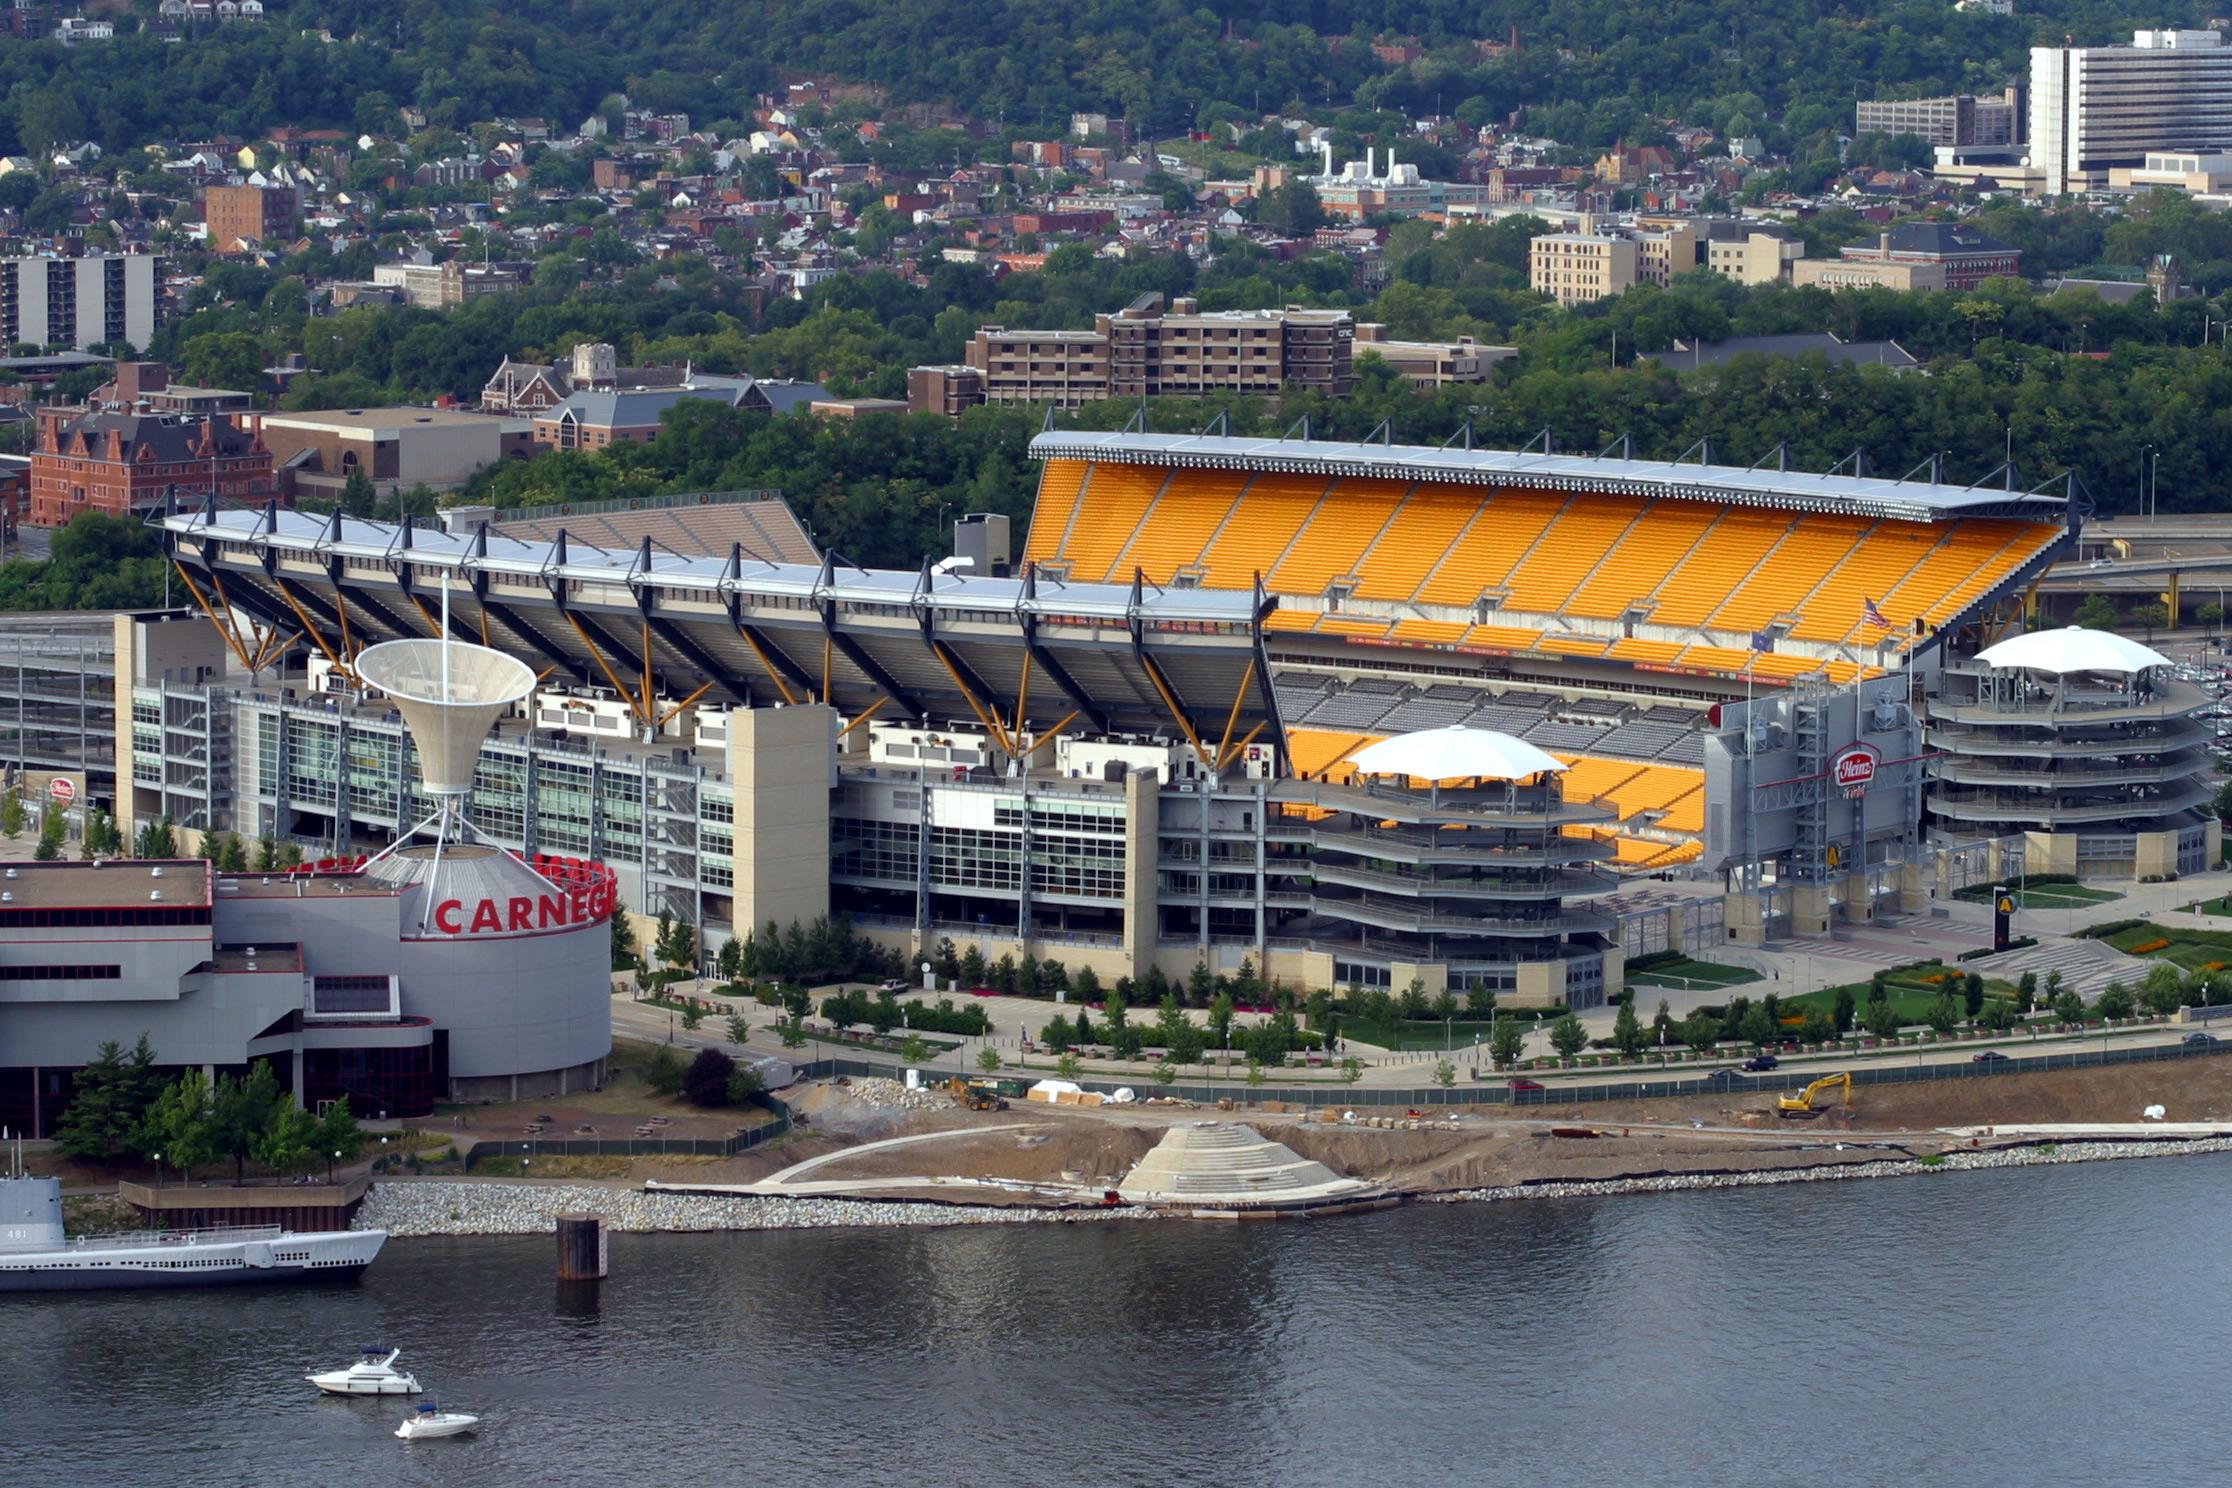 Penn State vs Pittsburgh